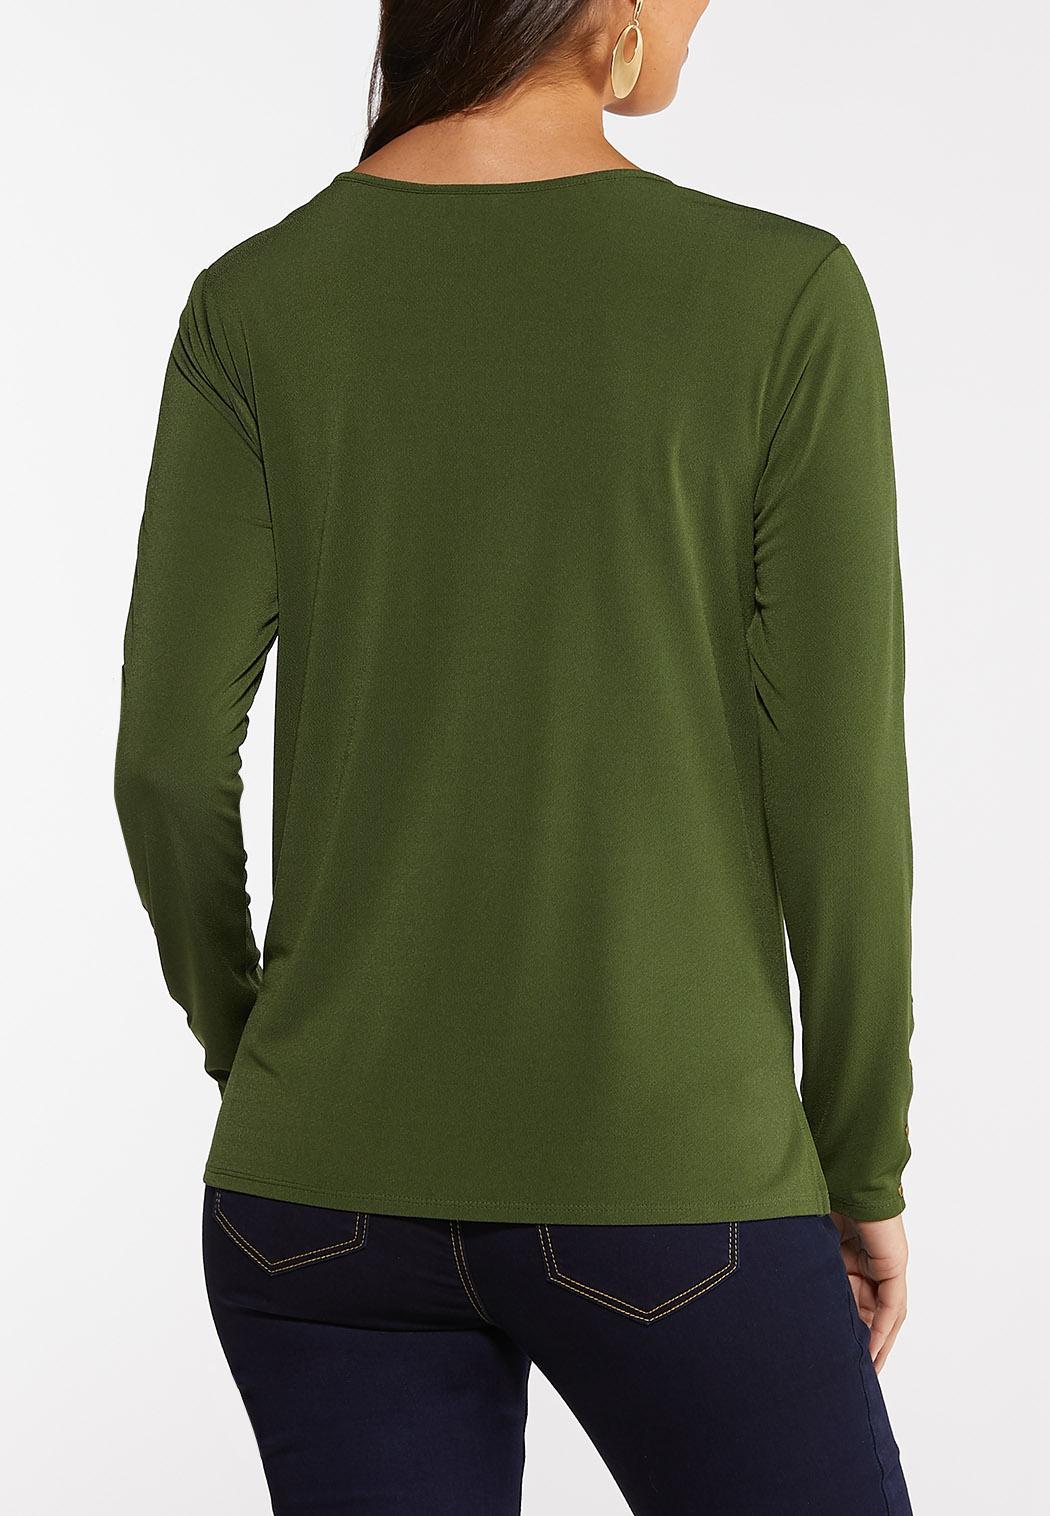 Plus Size Zipper Hardware Top (Item #44060703)